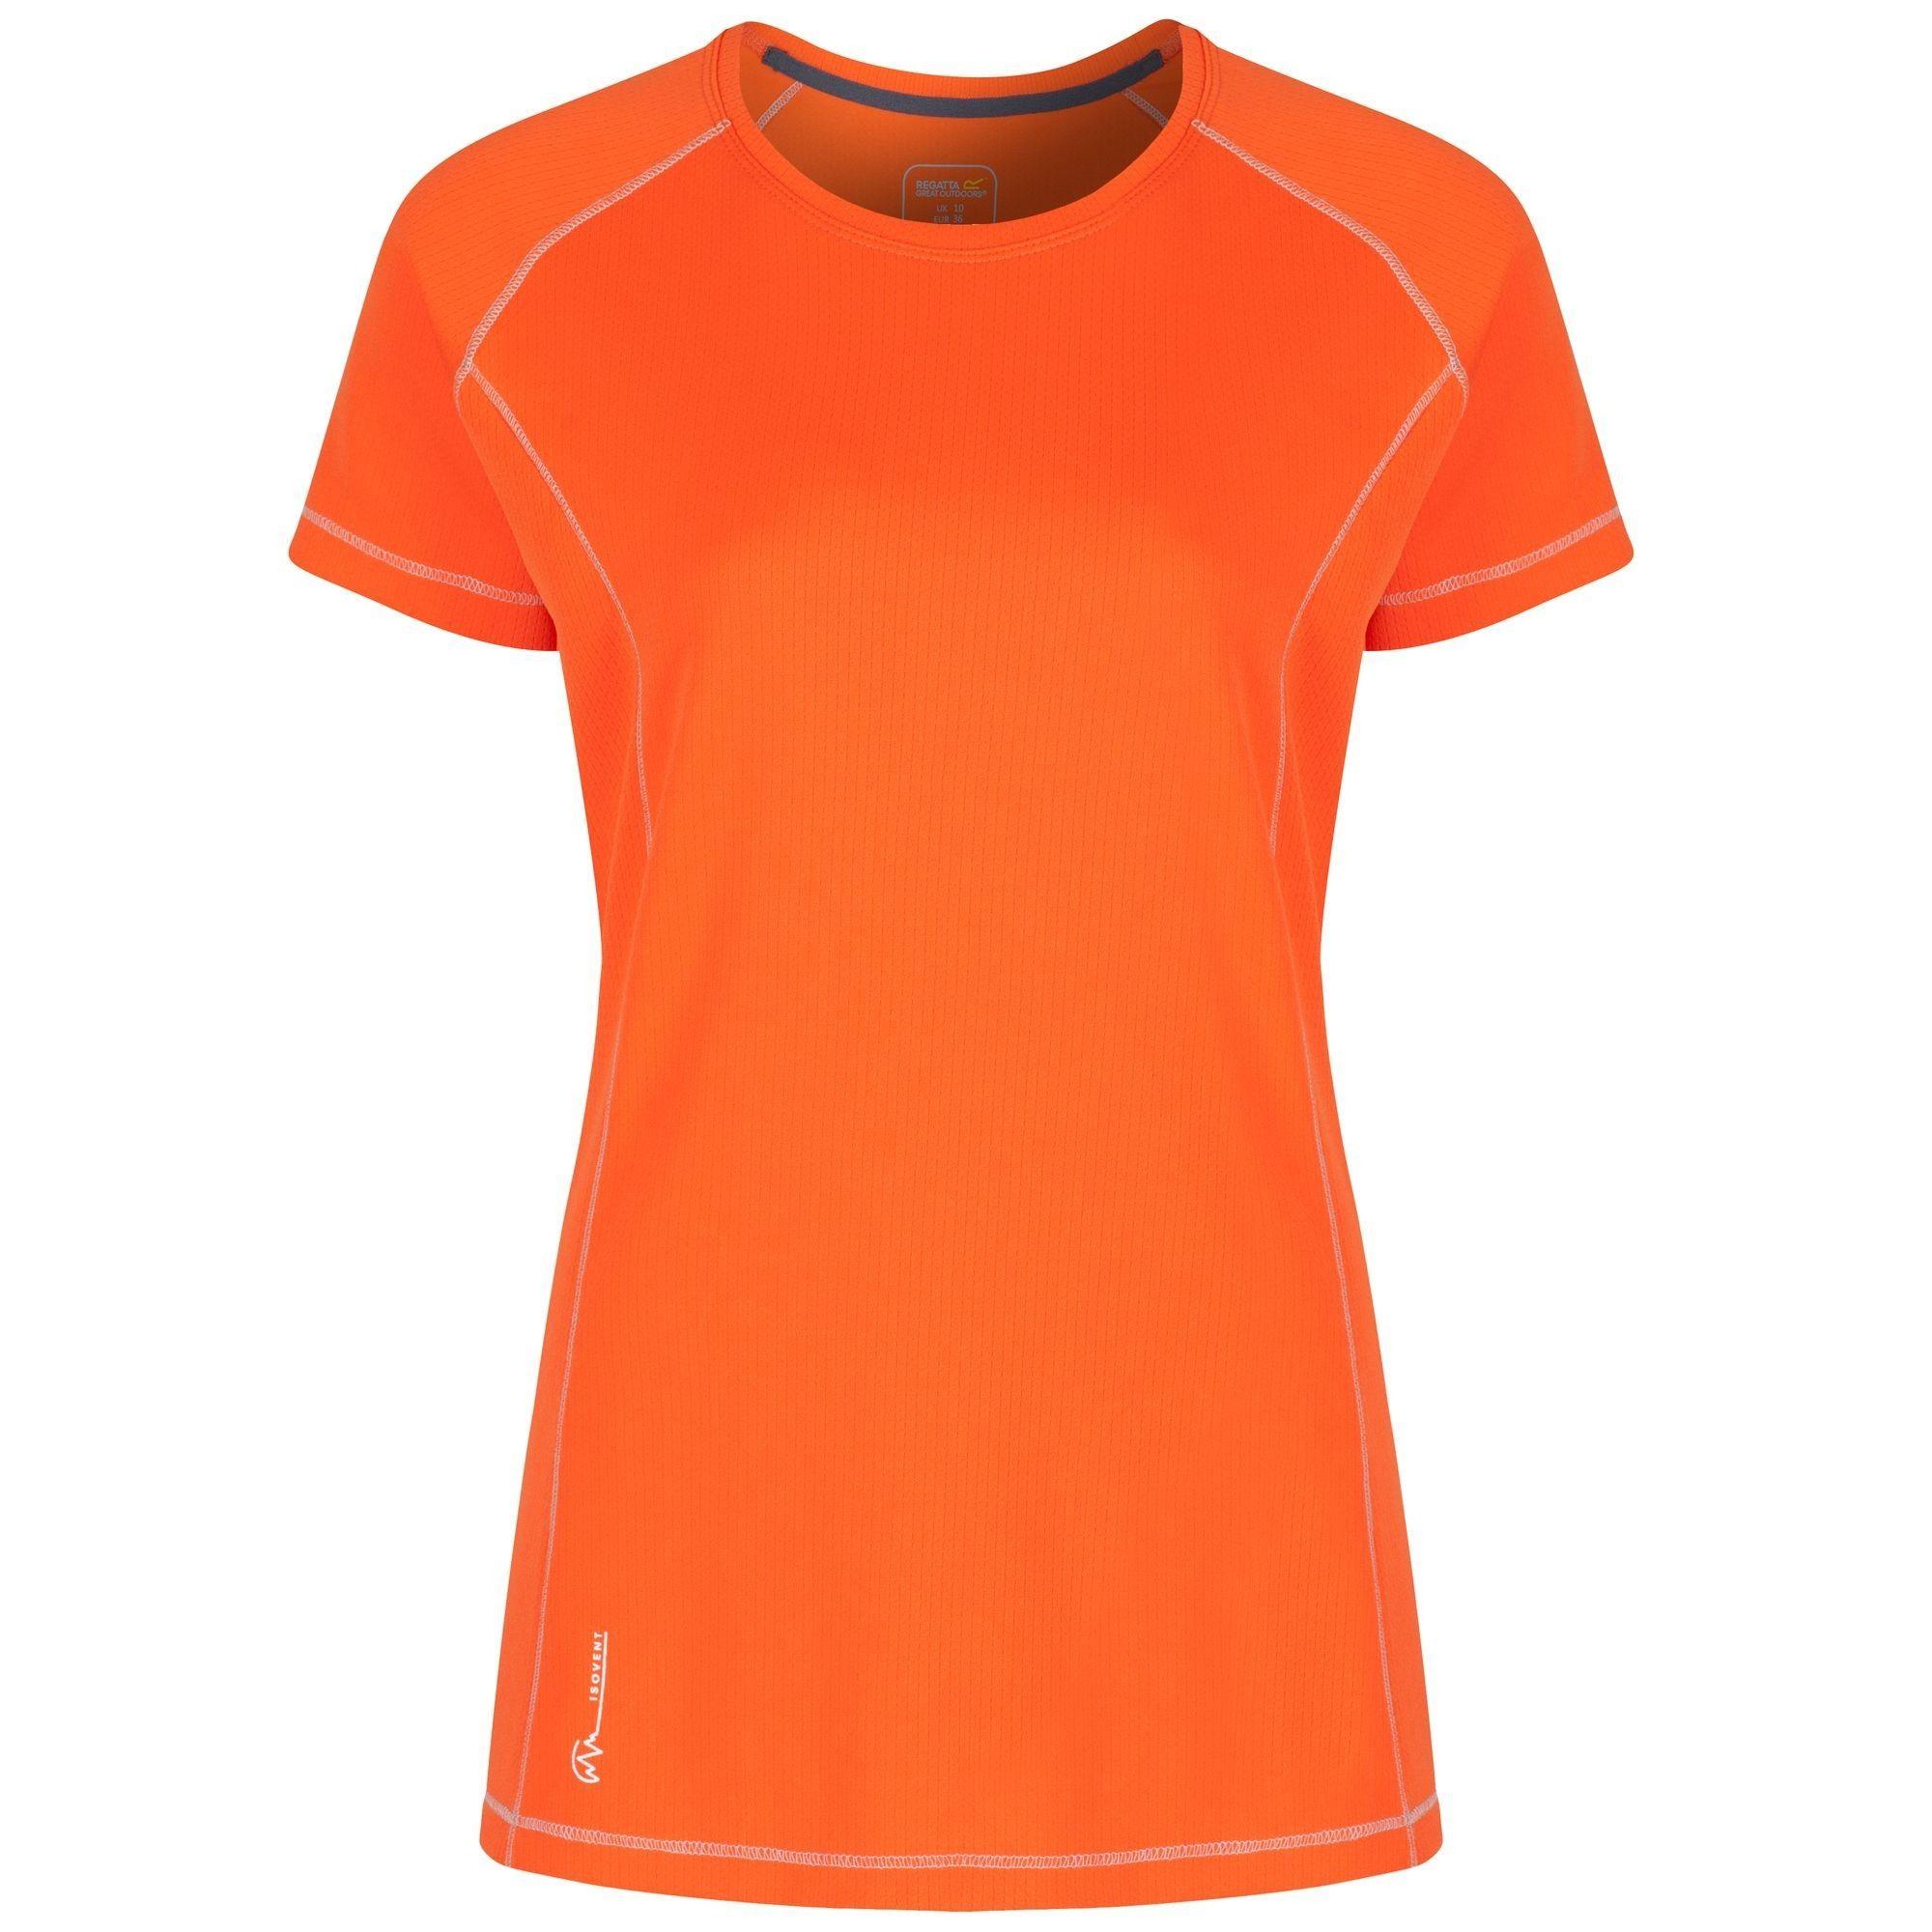 Regatta Great Outdoors Womens/Ladies Virda Short Sleeve Base Layer T-Shirt